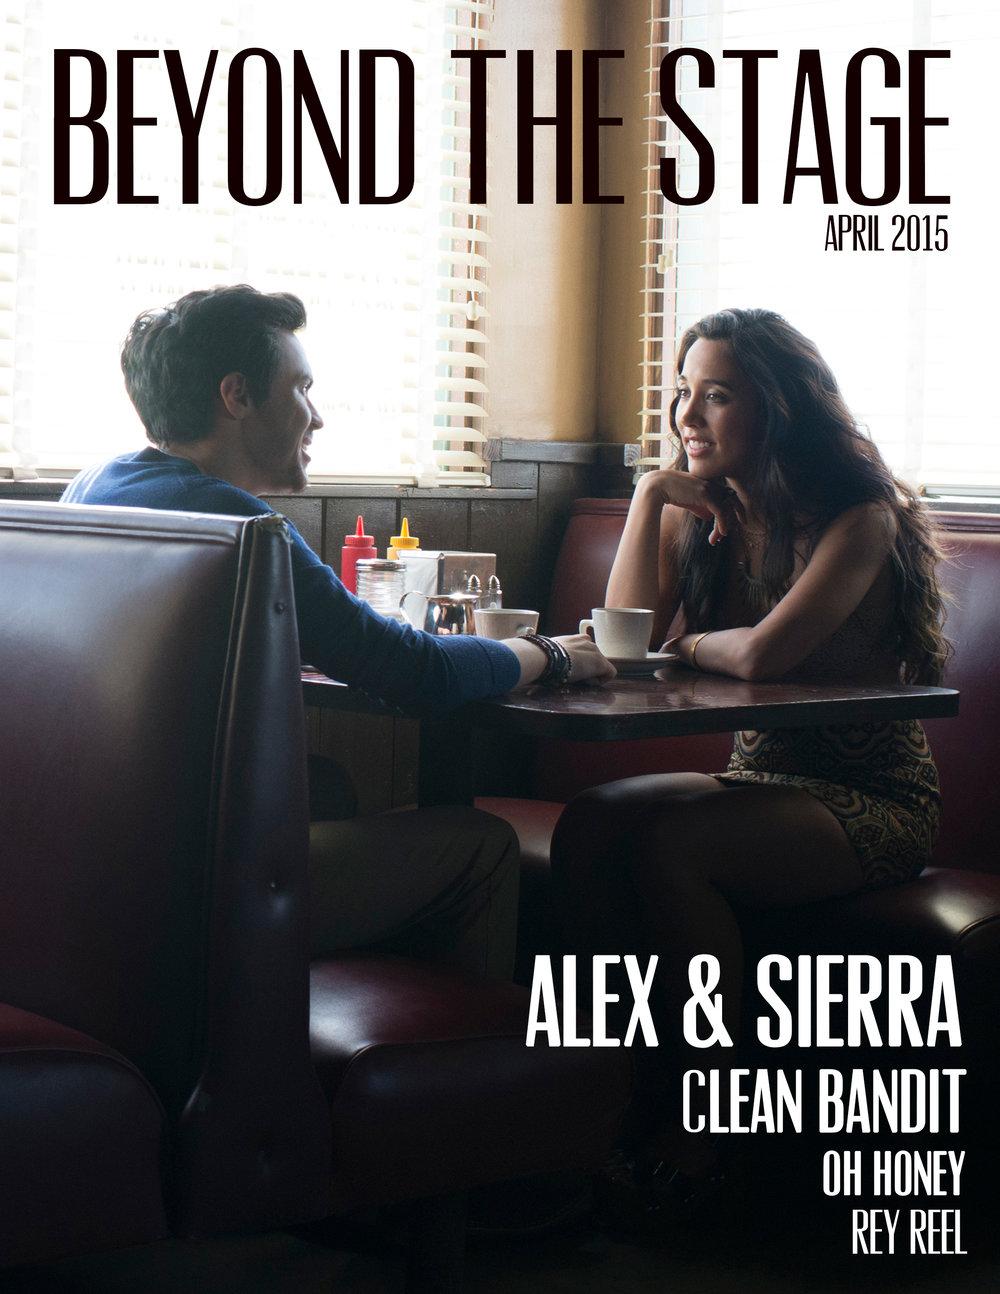 Alex & Sierra Cover 1 (1).jpg